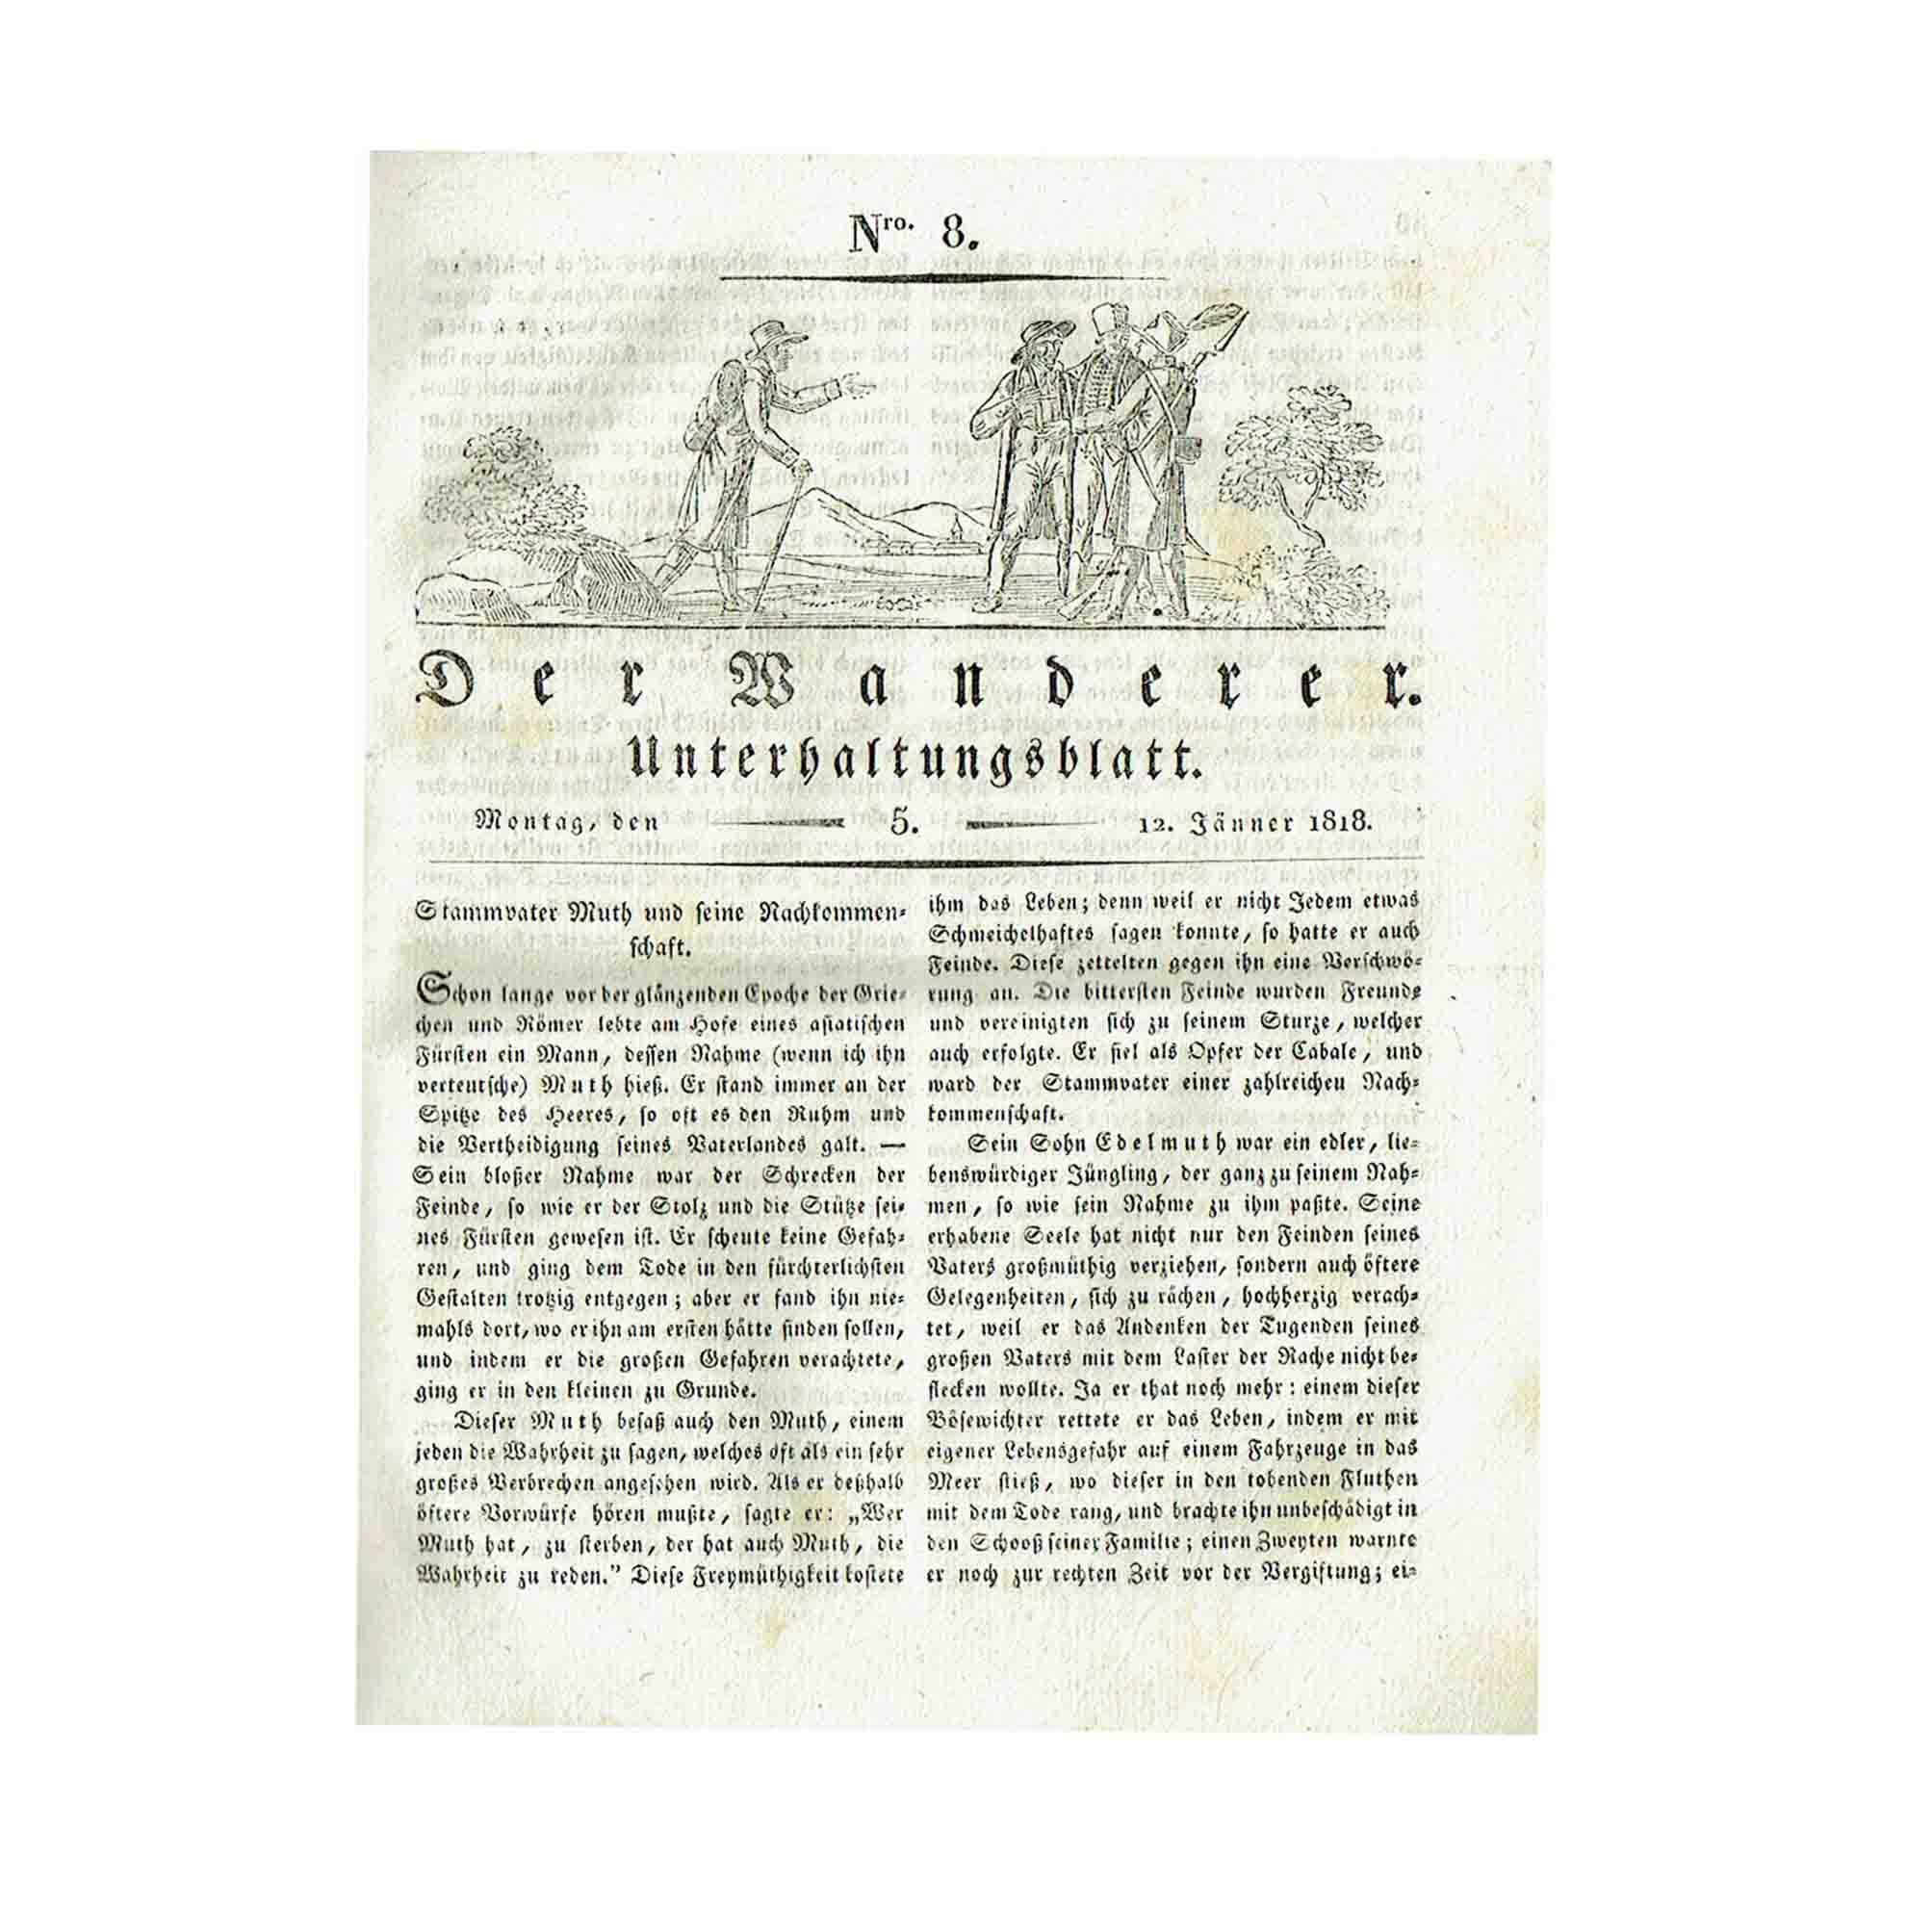 5702-Der-Wanderer-Wien-1818-Titelseite-N.jpeg